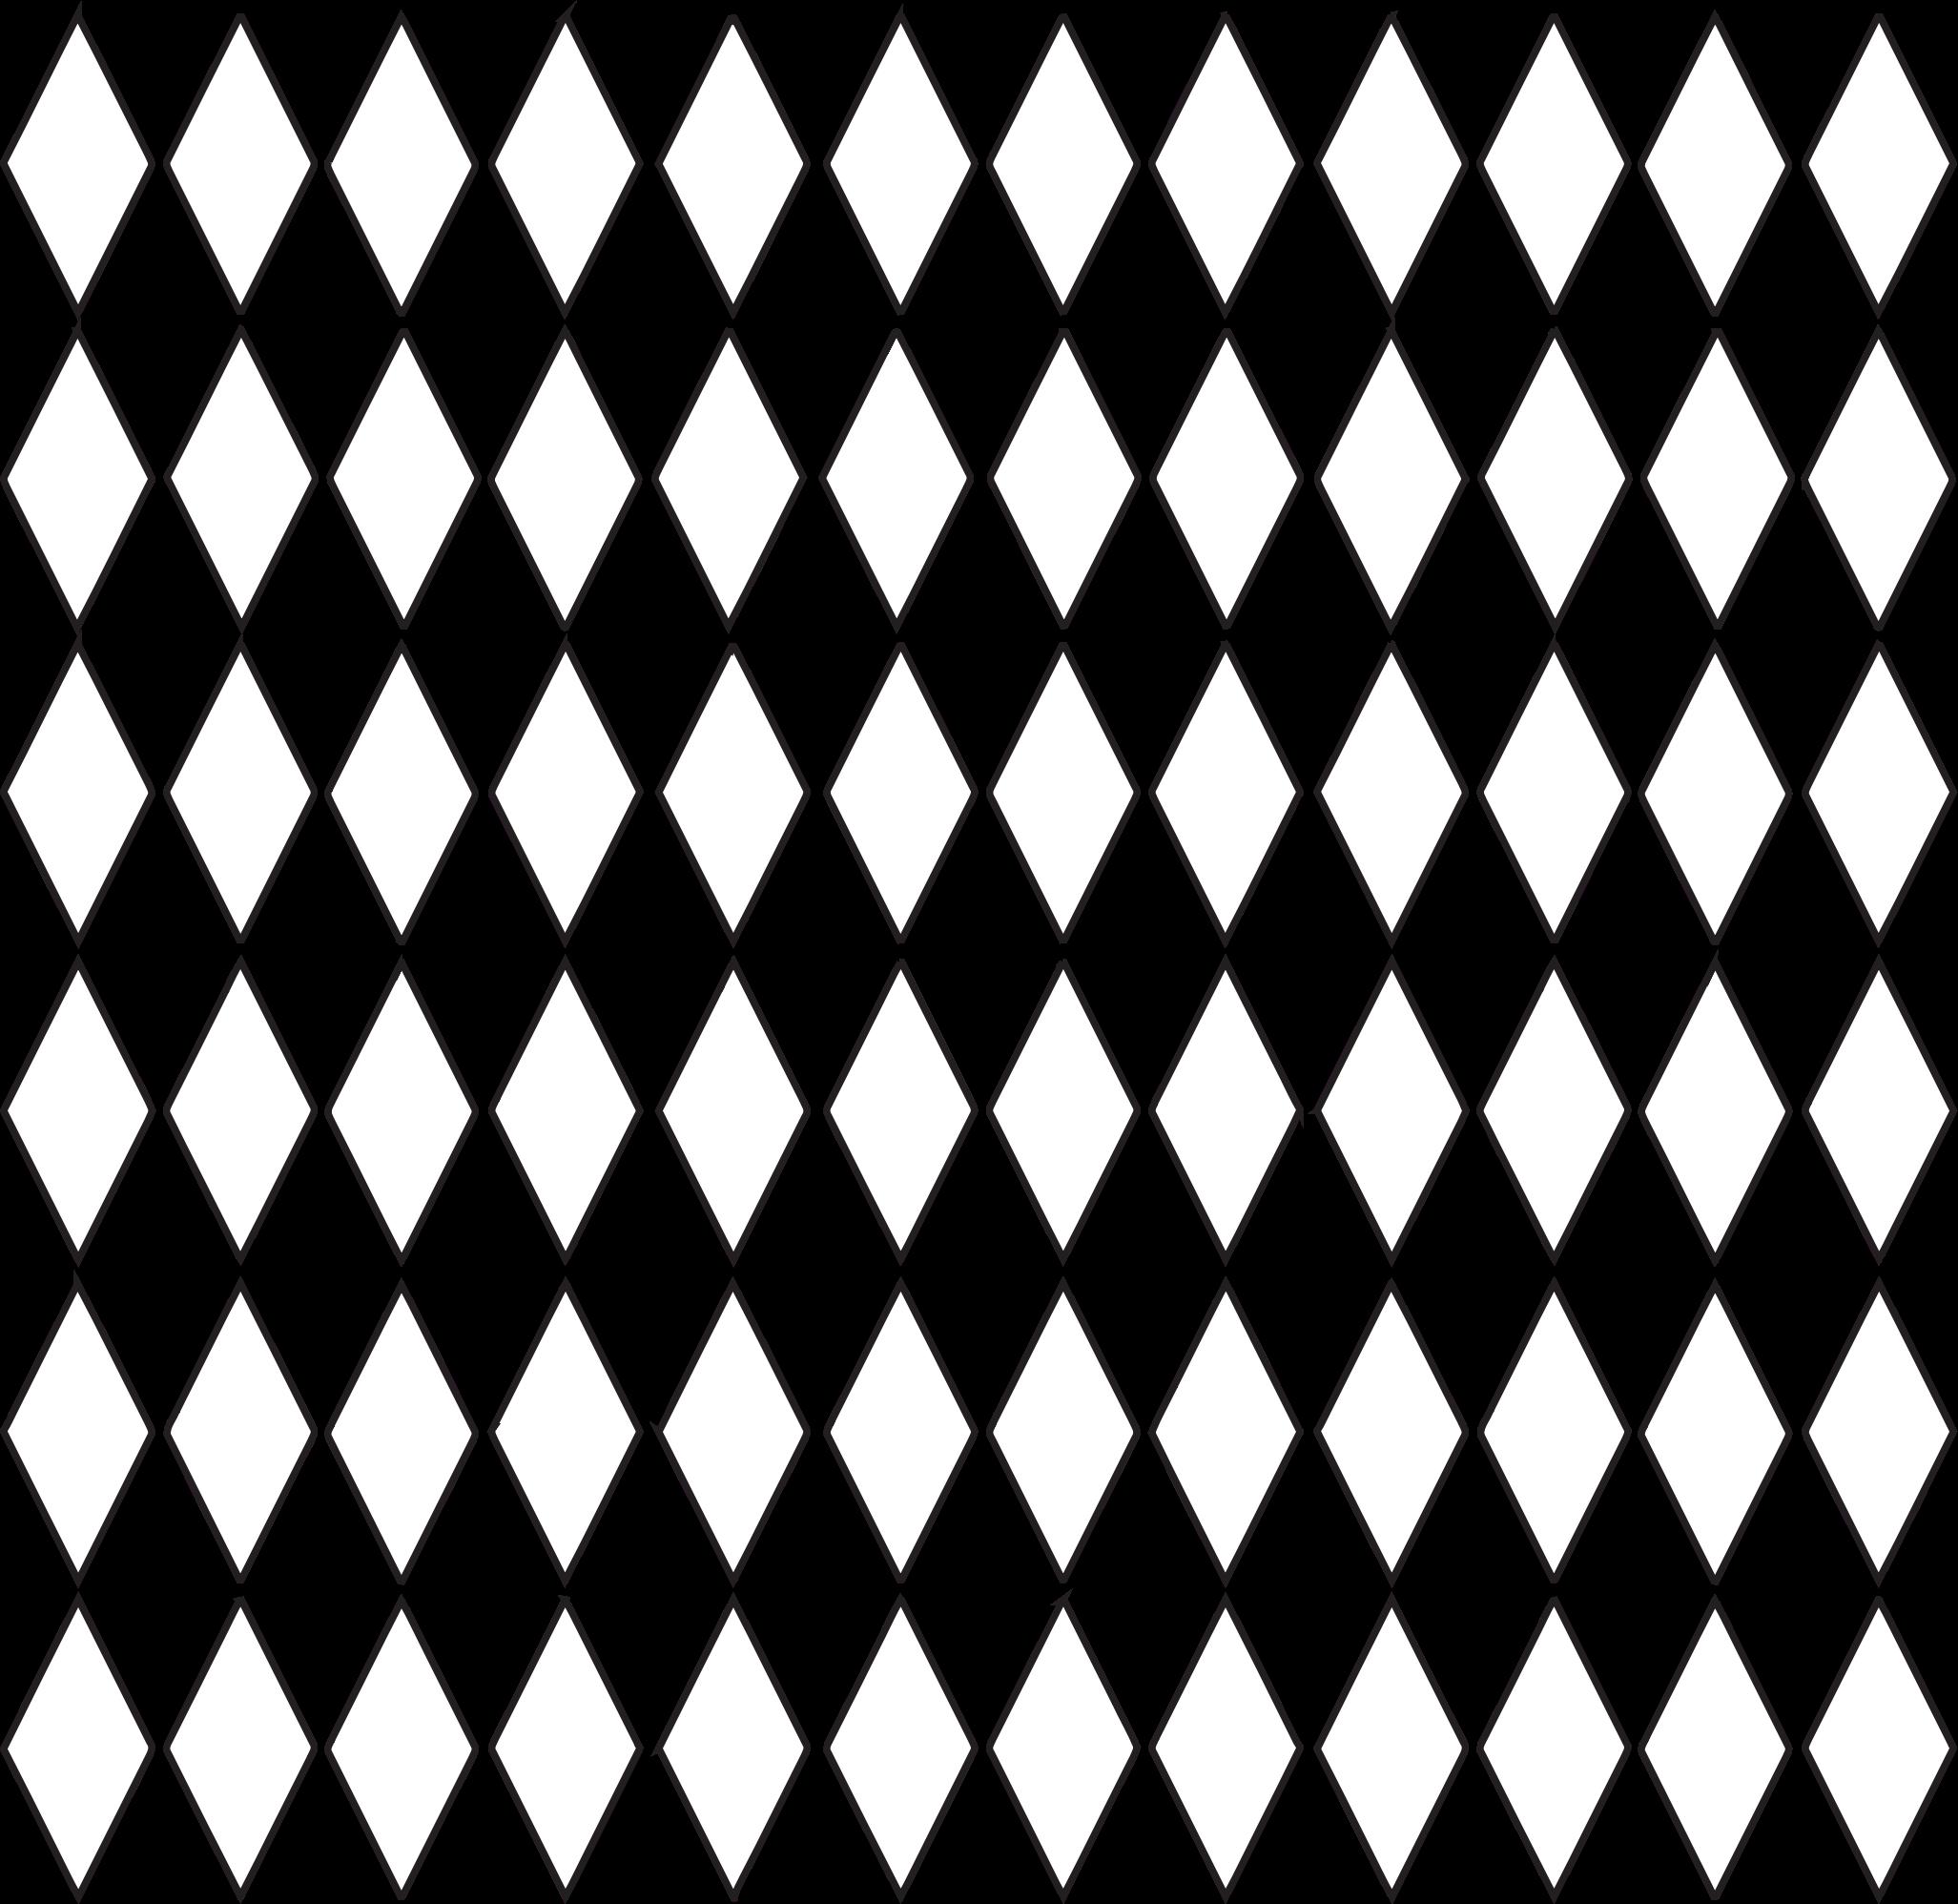 Grid pattern no color. Clipart diamond svg